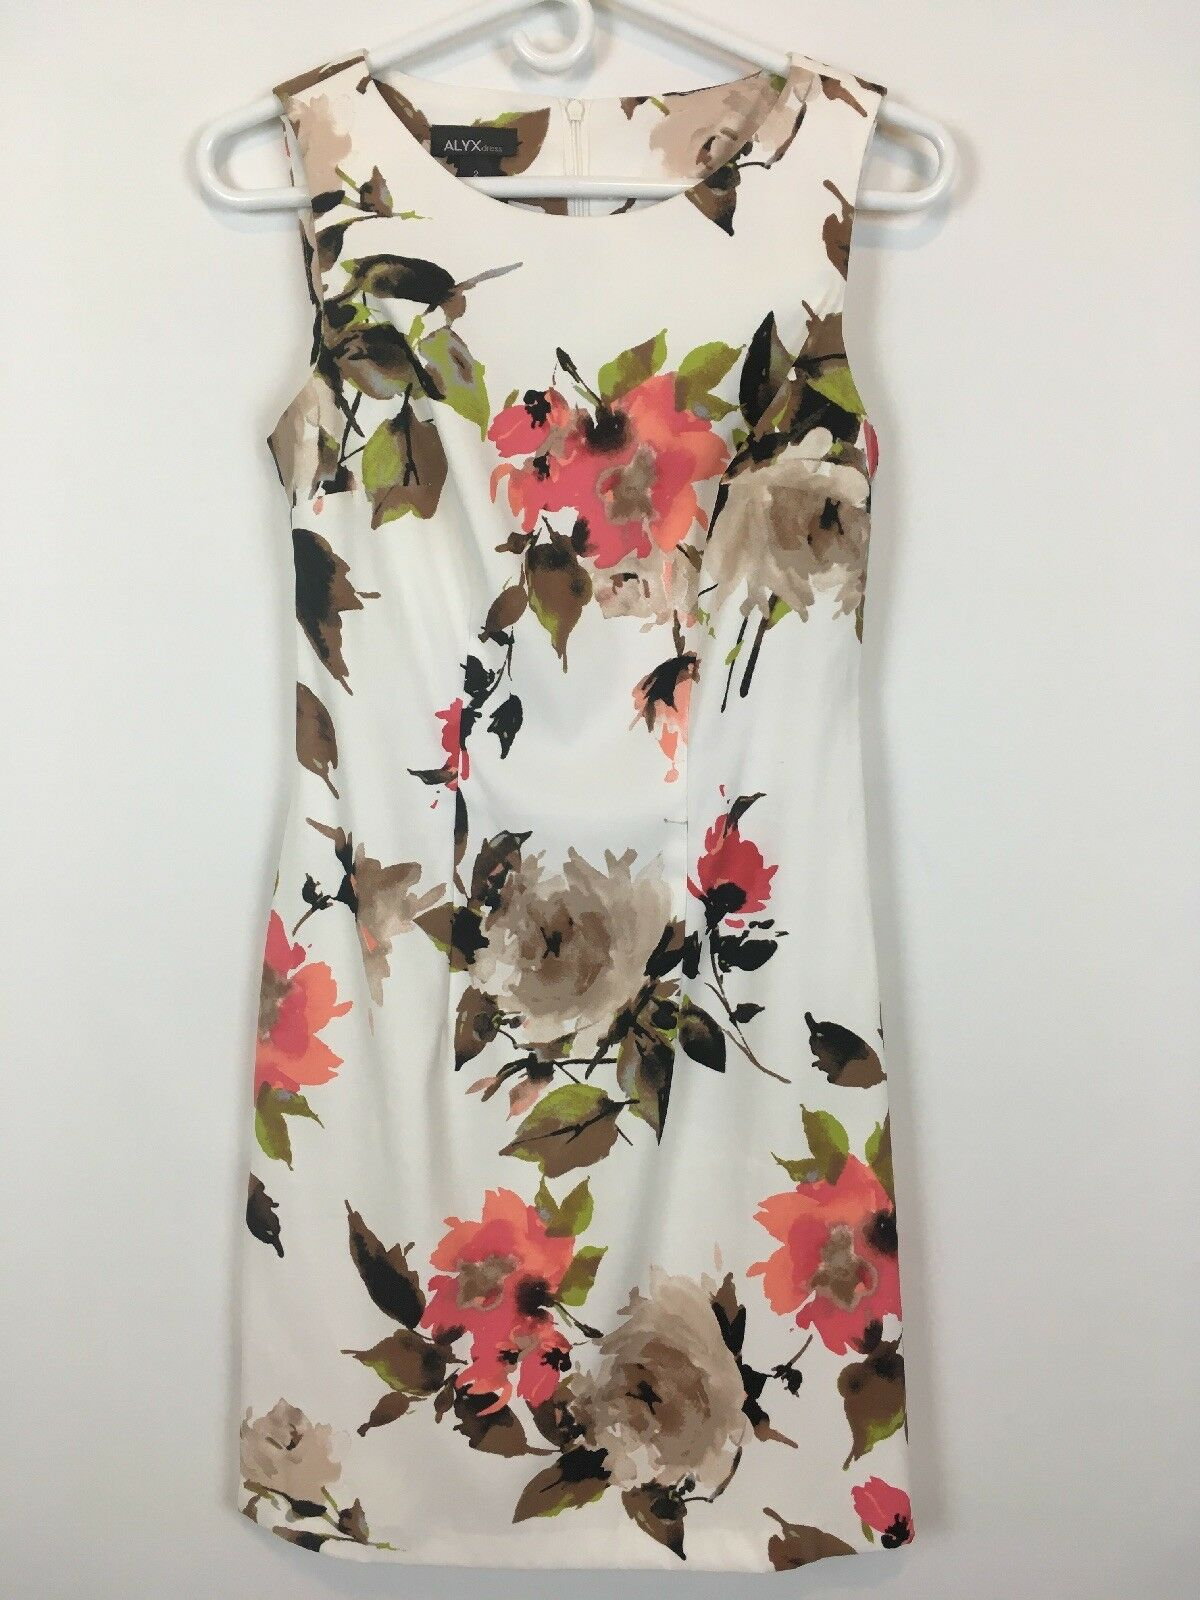 Alyx Dress Womens pinks Floral Sleeveless Sheath Midi Dress Size 2 A1203